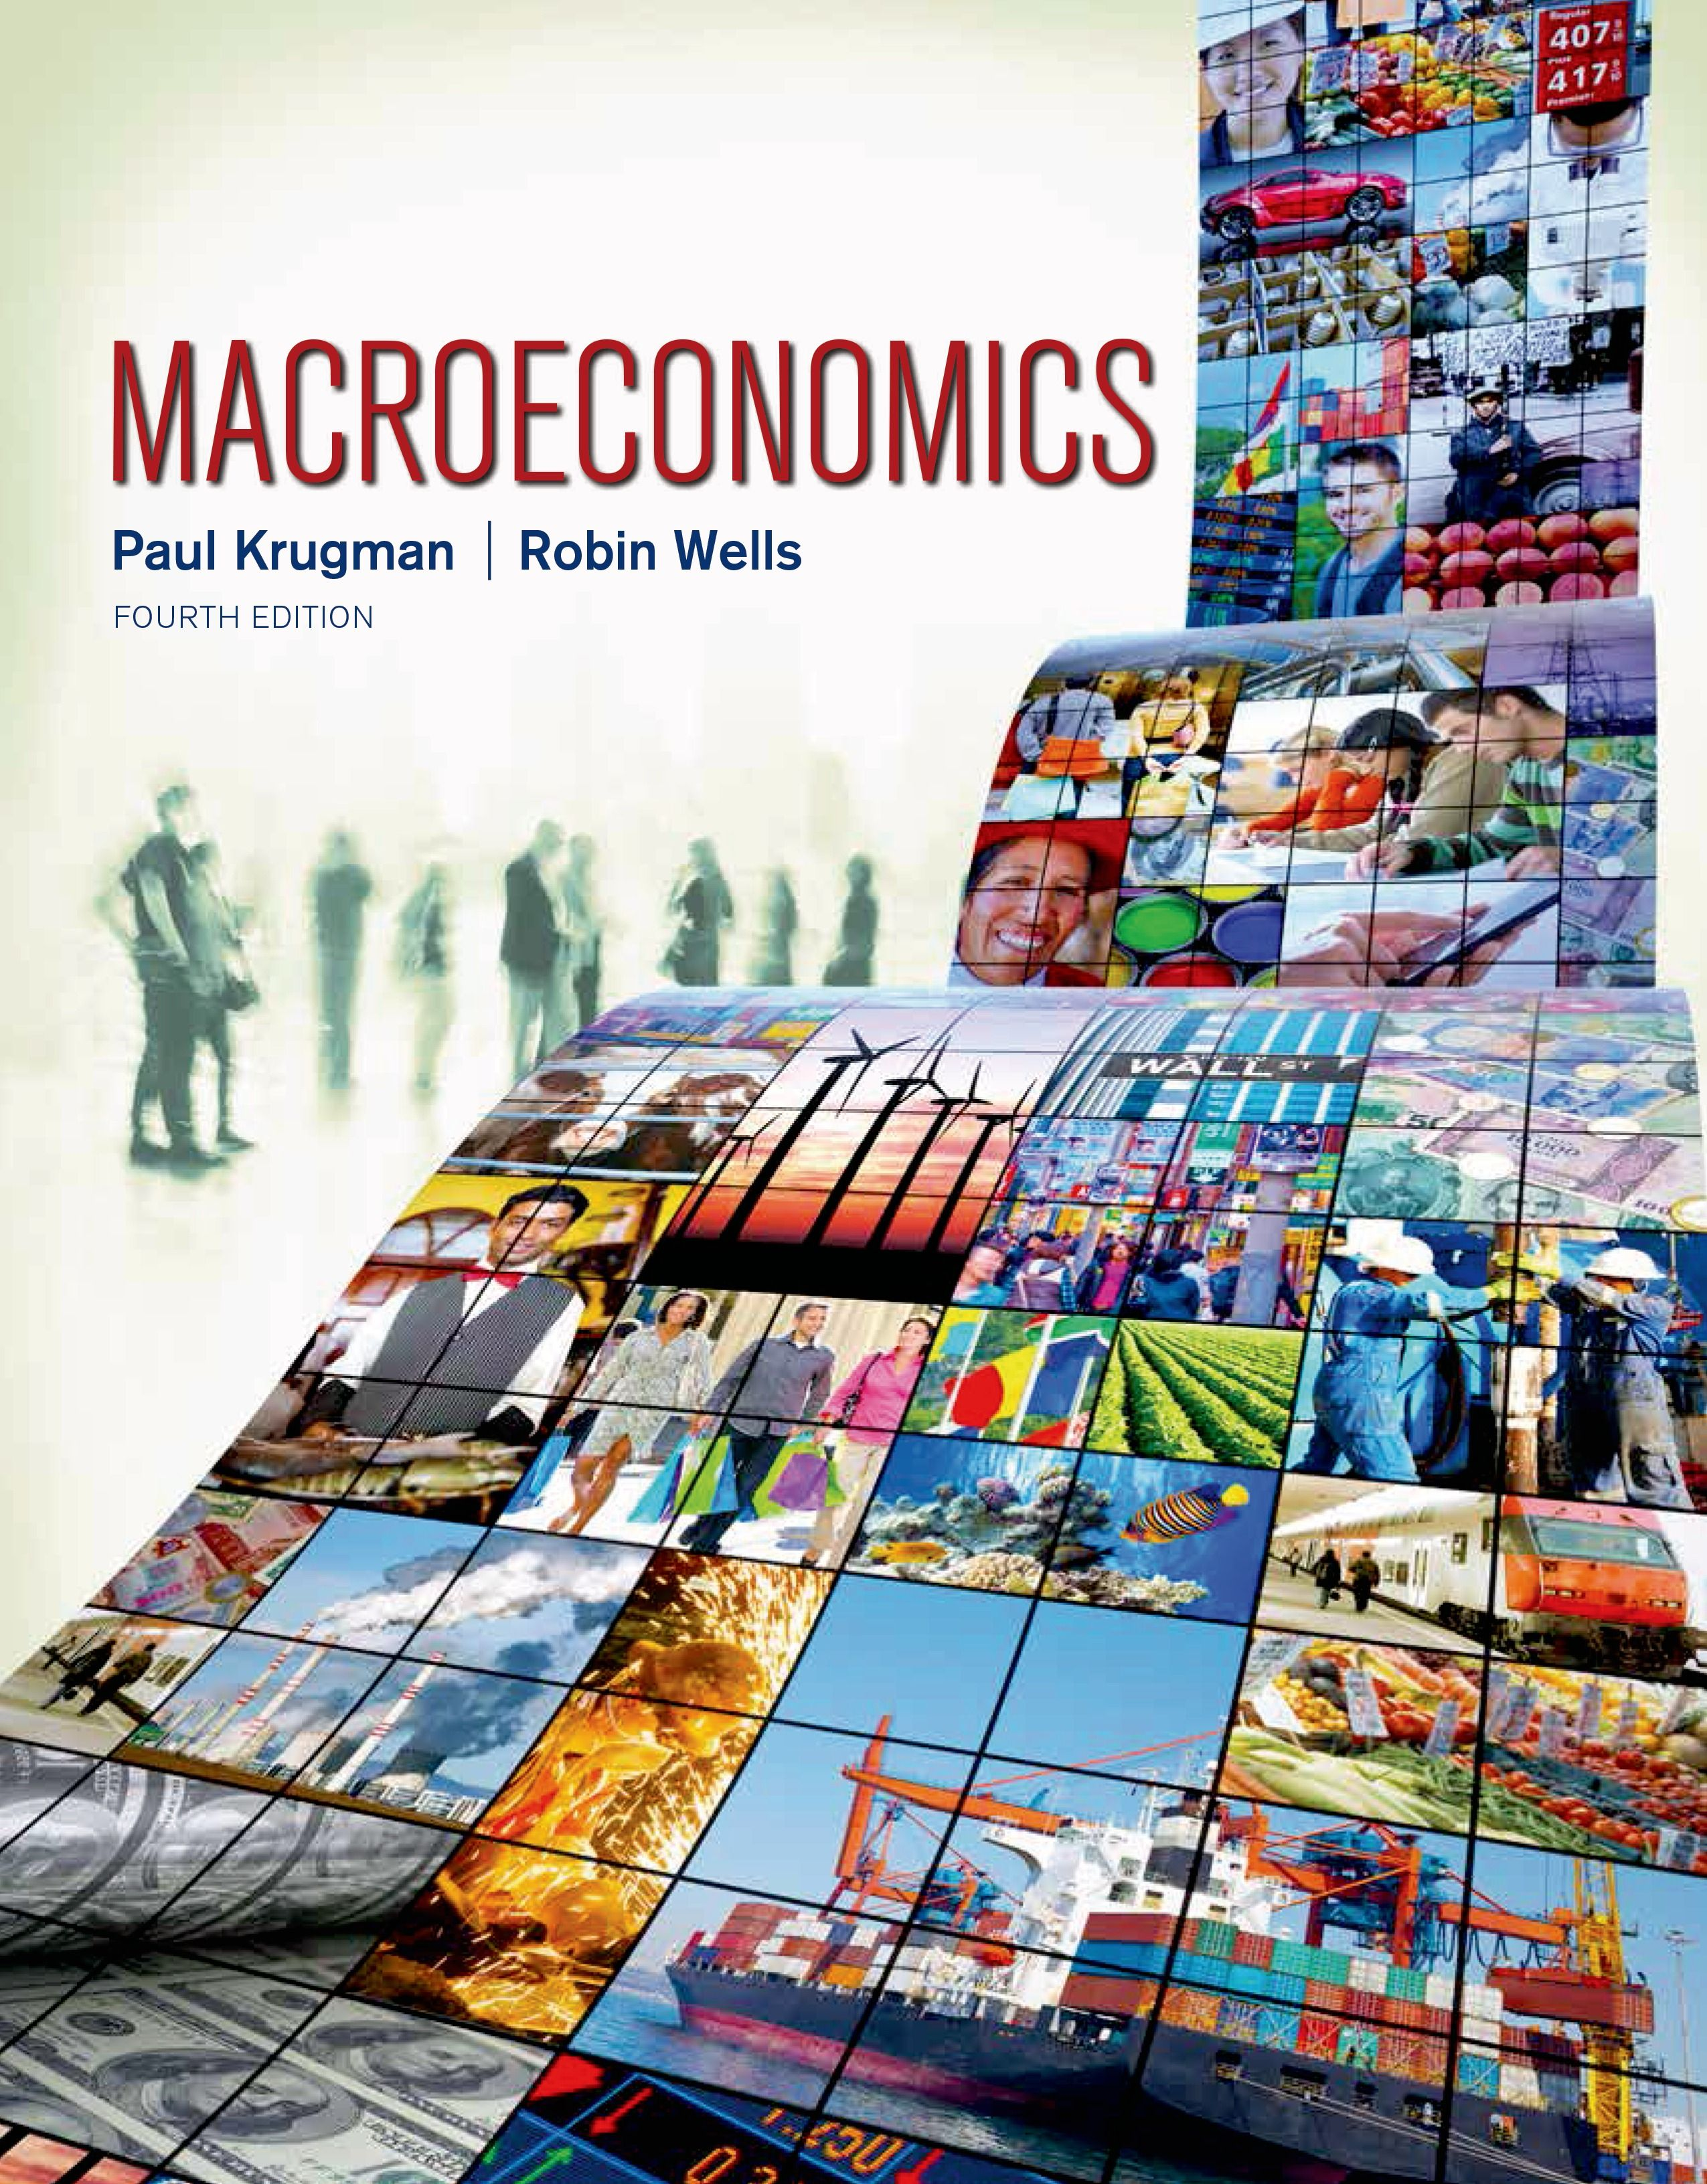 Macroeconomics De Paul Krugman Et Robin Wells Contents